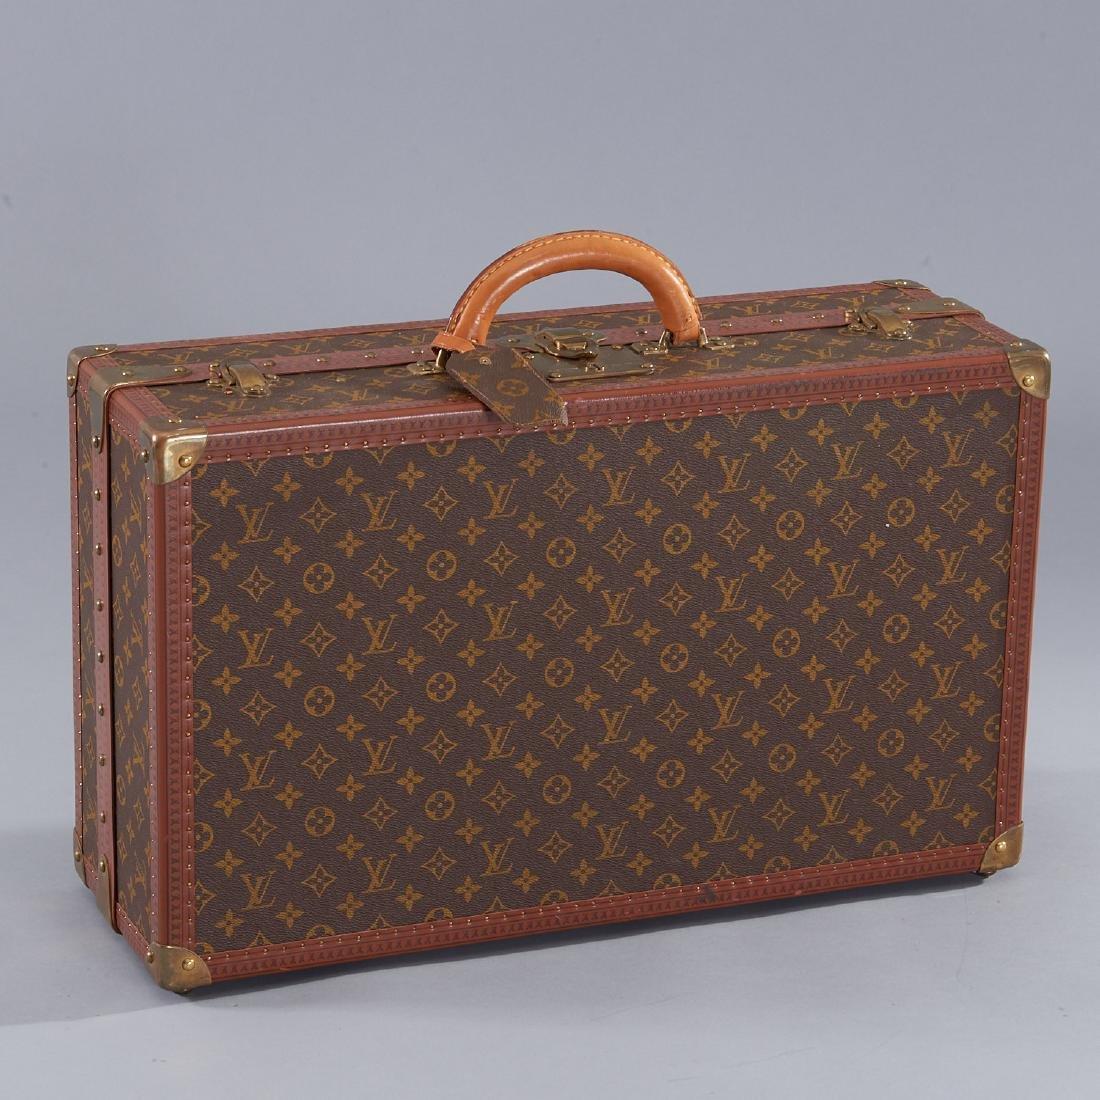 Louis Vuitton Monogram hard sided shoe trunk